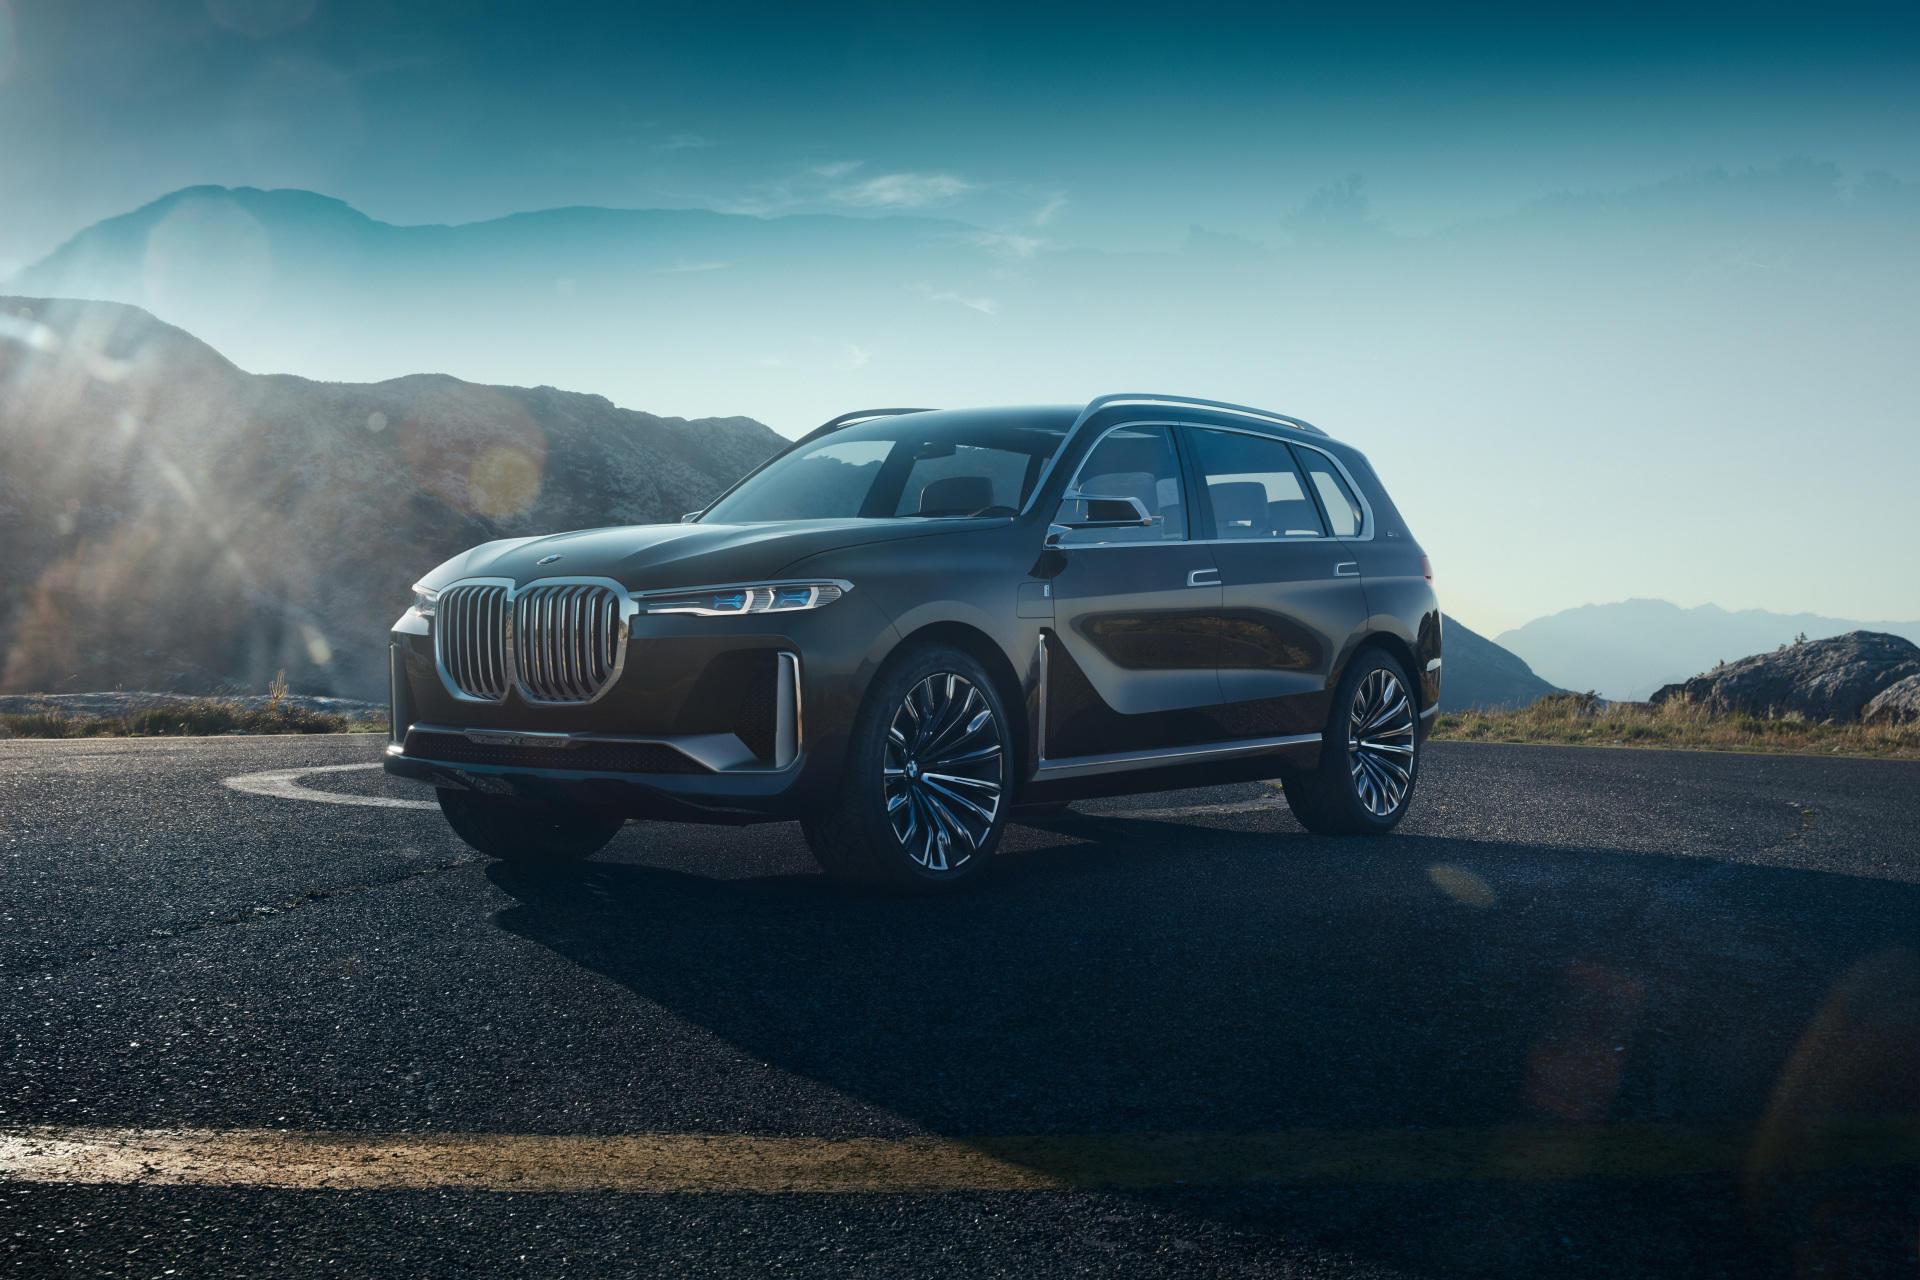 BMW-x7-concept-dm-1.jpg